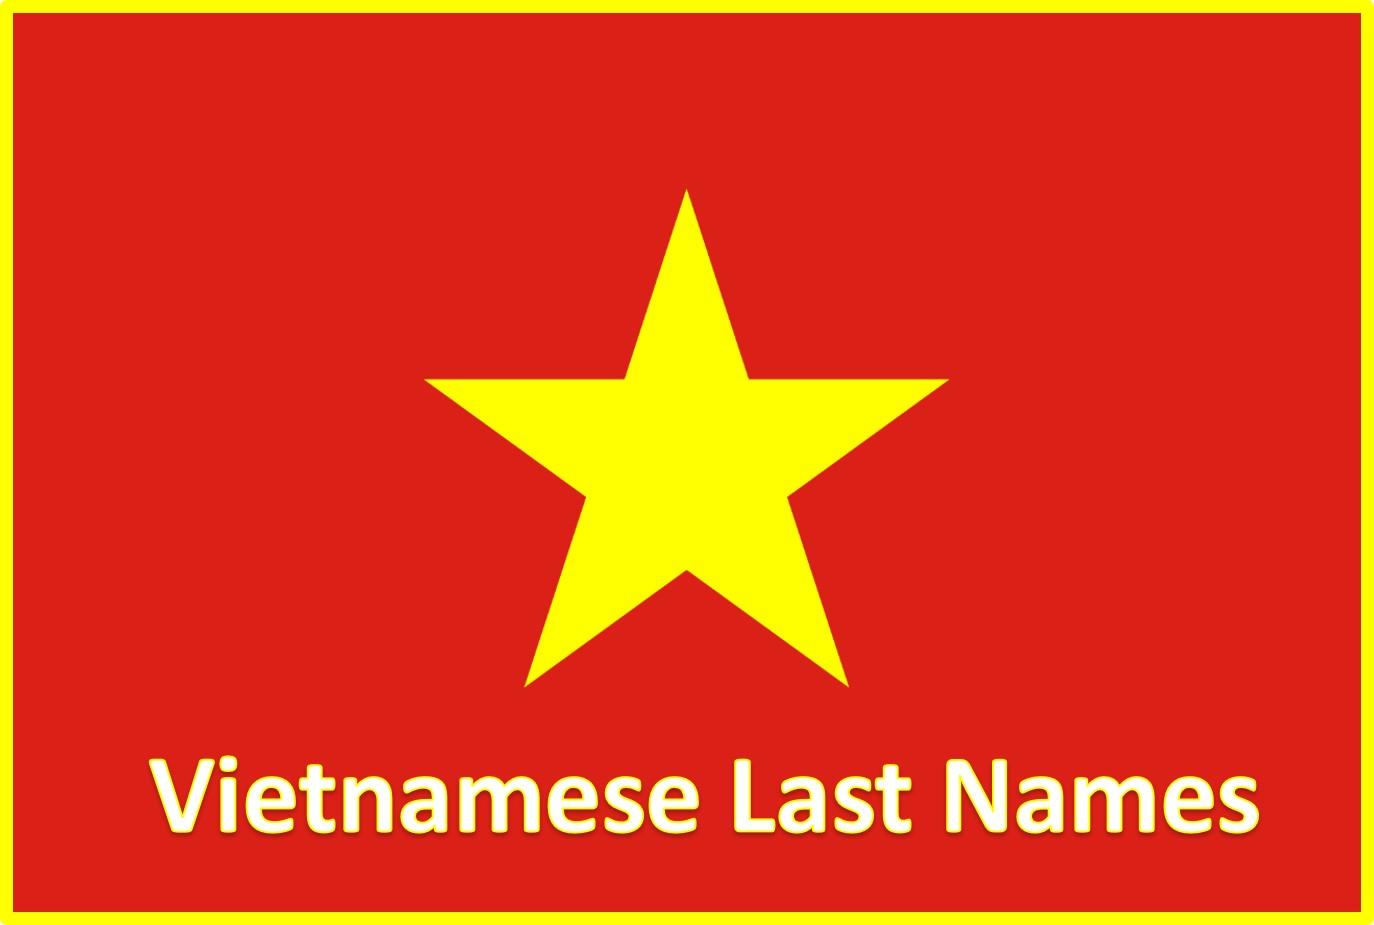 Vietnamese Last Names